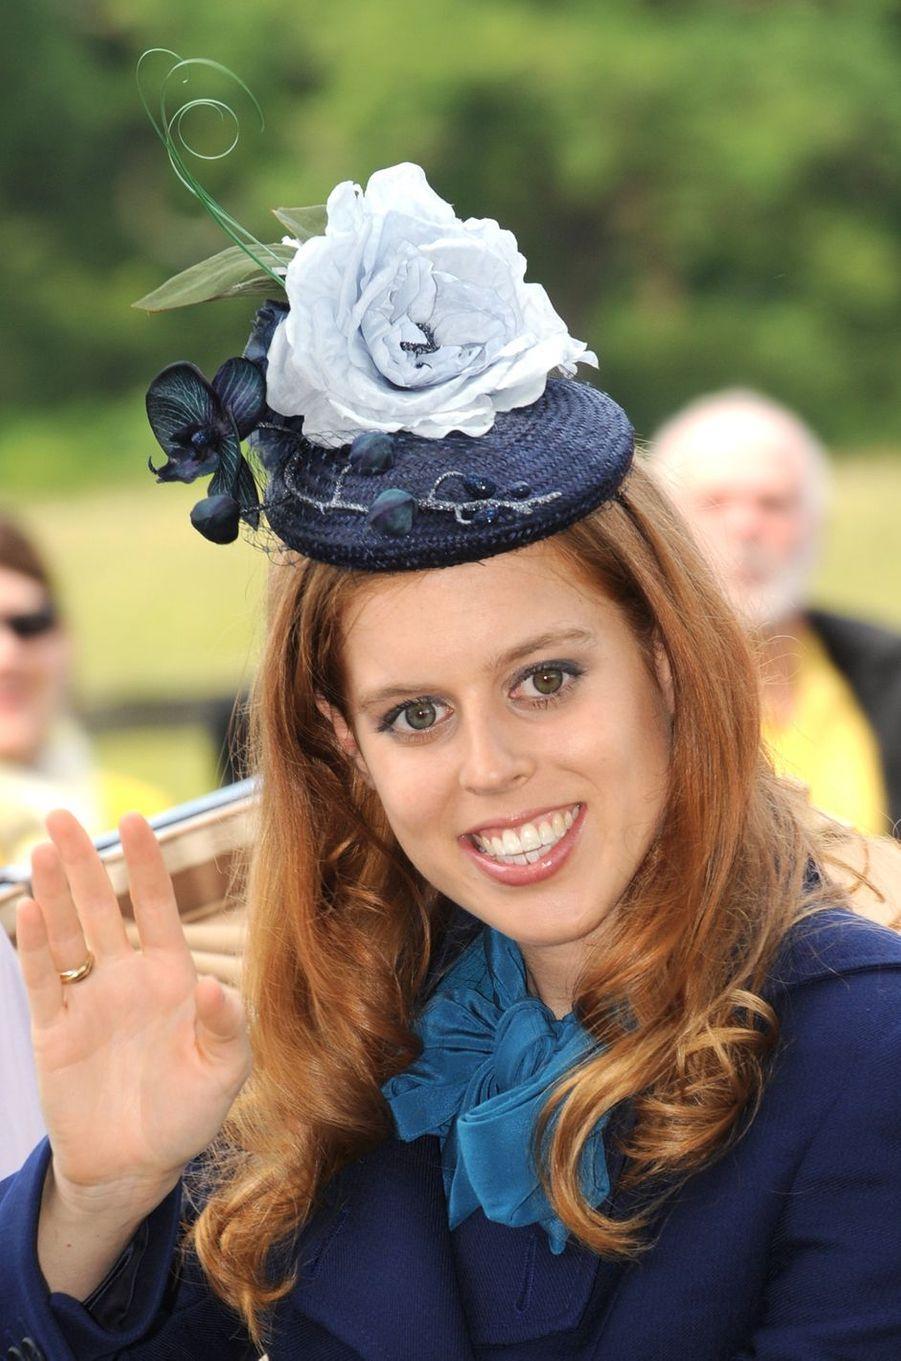 La princesse Beatrice d'York, le 16 juin 2011